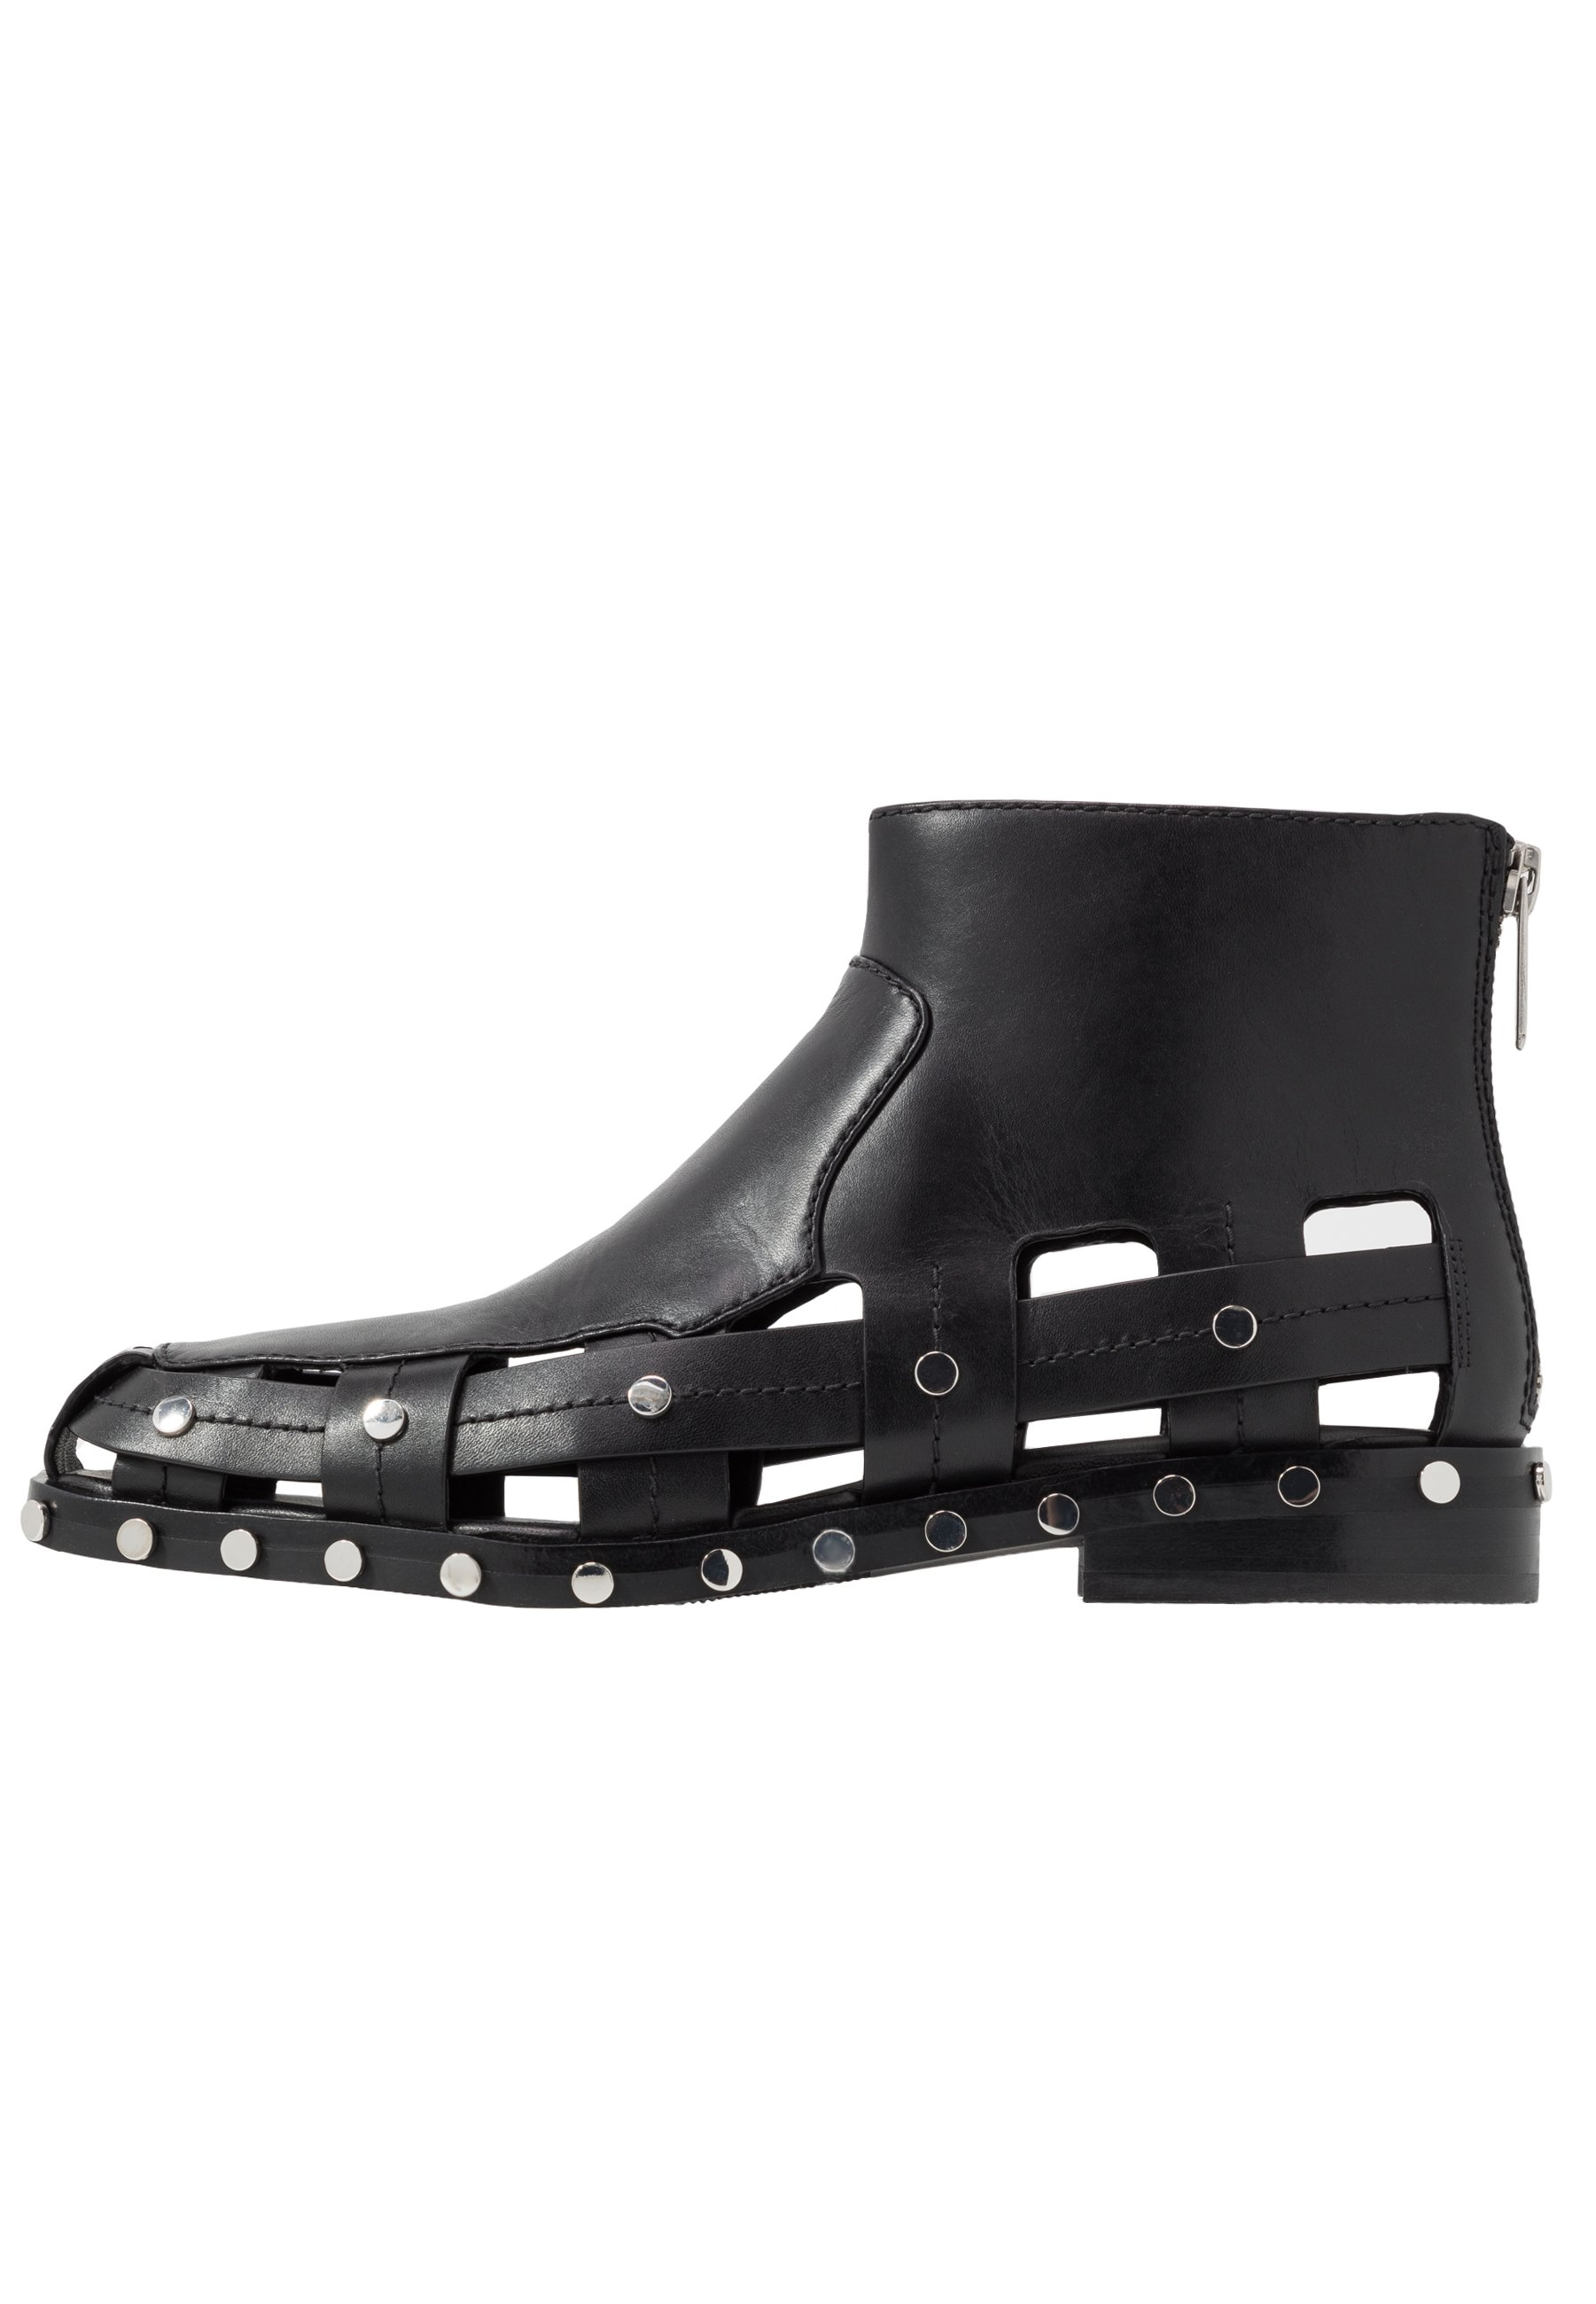 3.1 Phillip Lim Alexa Studs - Ankelboots Black